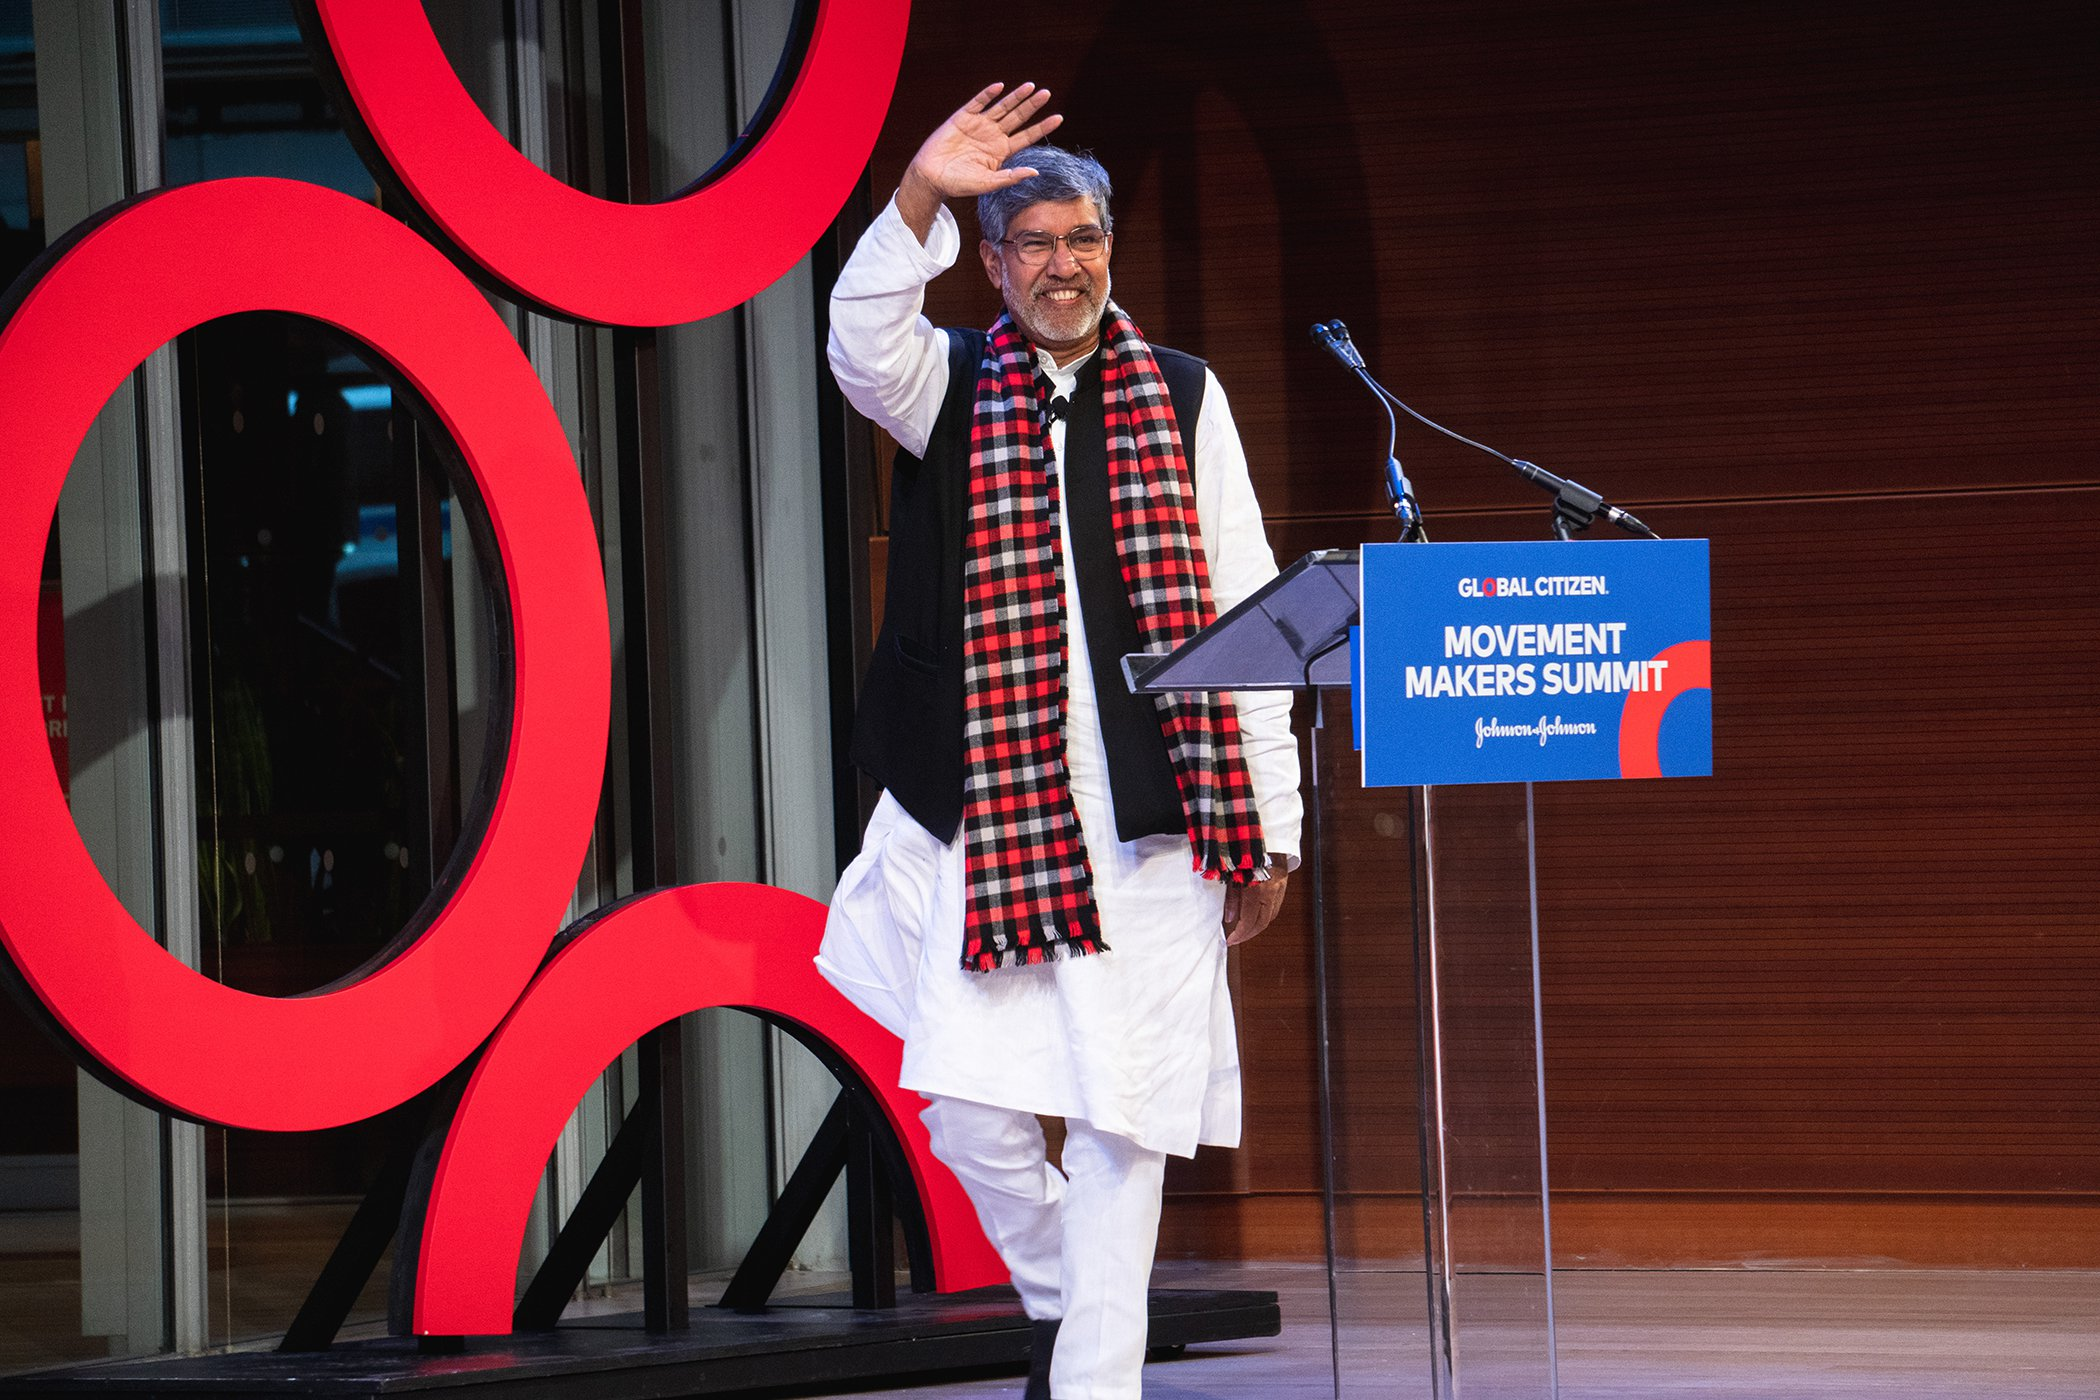 MovementMakers18_30 Kailash Satyarthi 00875_RyanMuirForGC.jpg